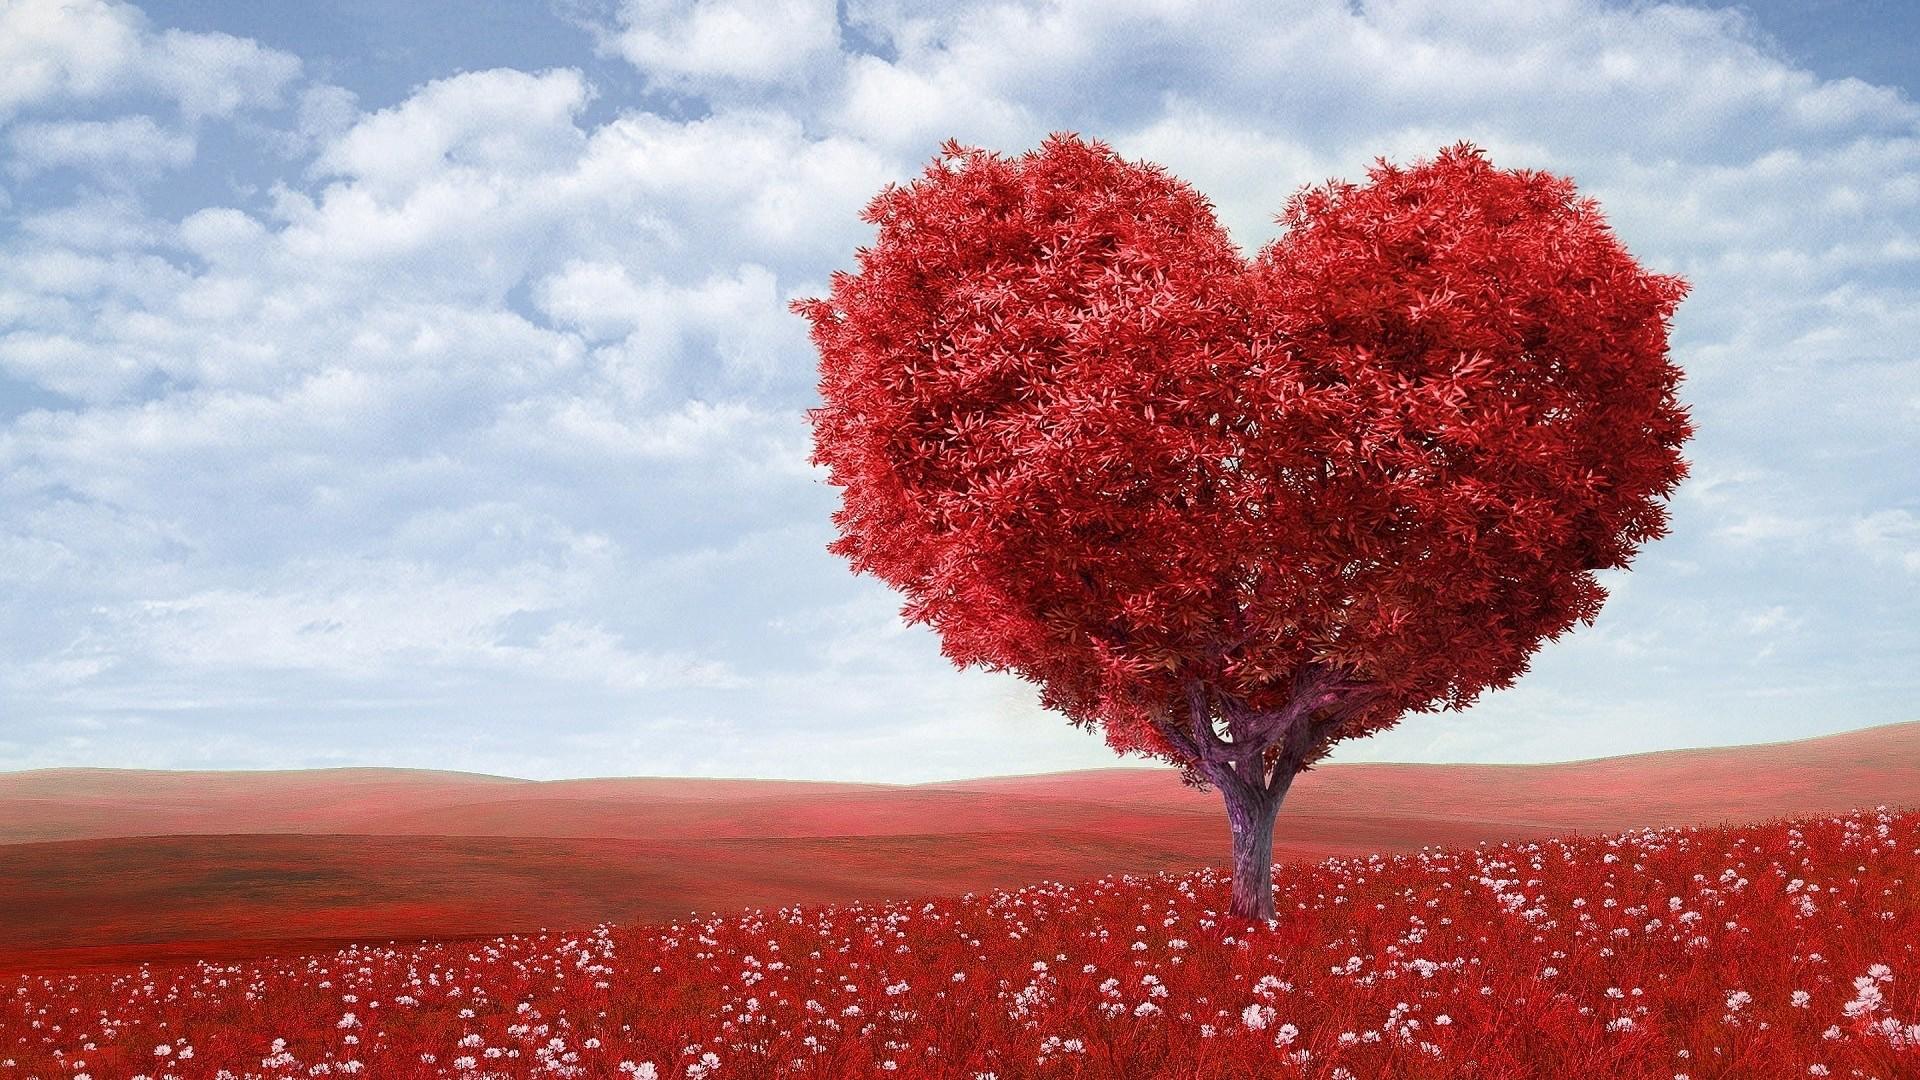 Love Background Wallpaper Hd 2020 Live Wallpaper Hd